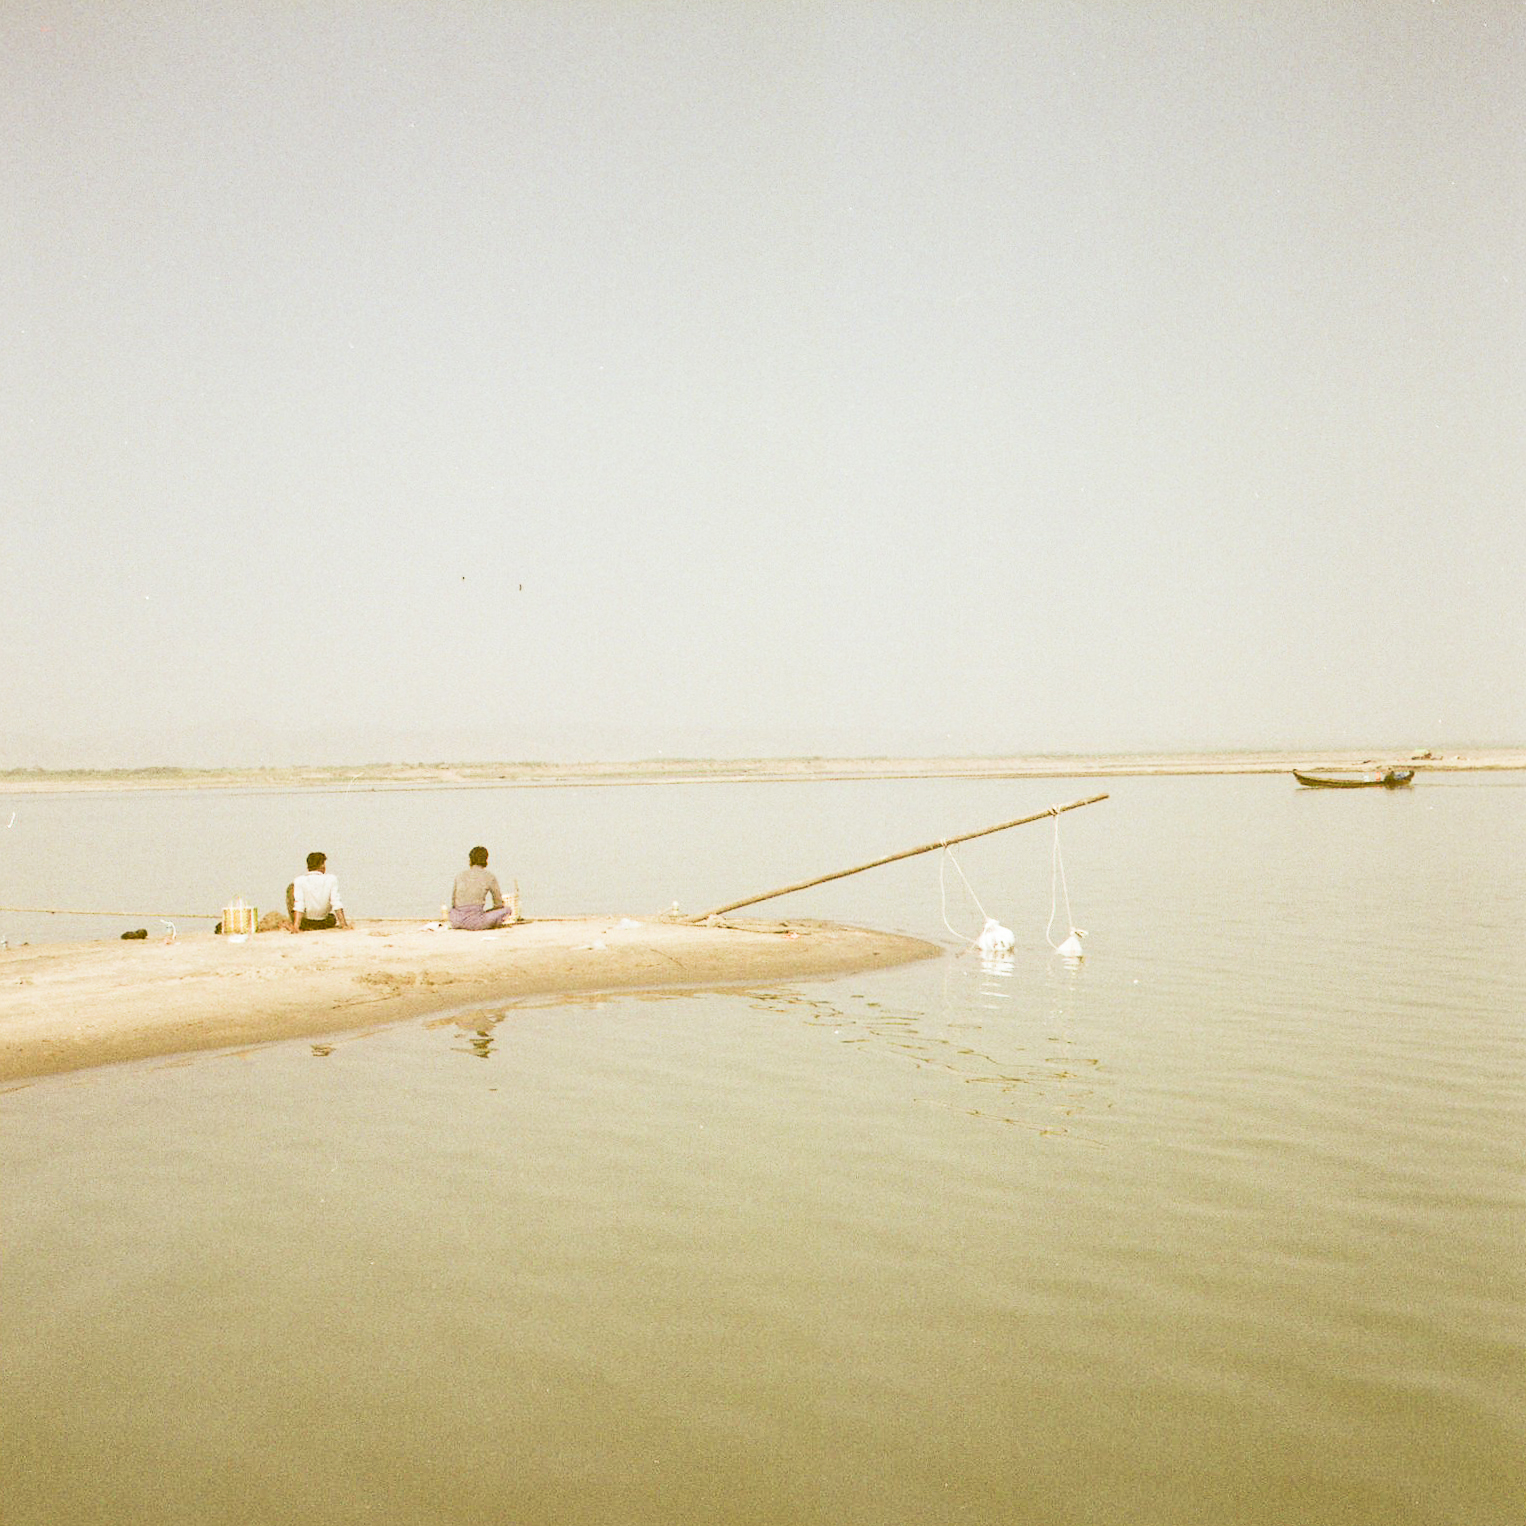 Fisherman in Bagan, fine art photography , travel photography, shooting film, medium format, Myanmar, Burma,raffaele ferrari, rolleiflex, fujifilm